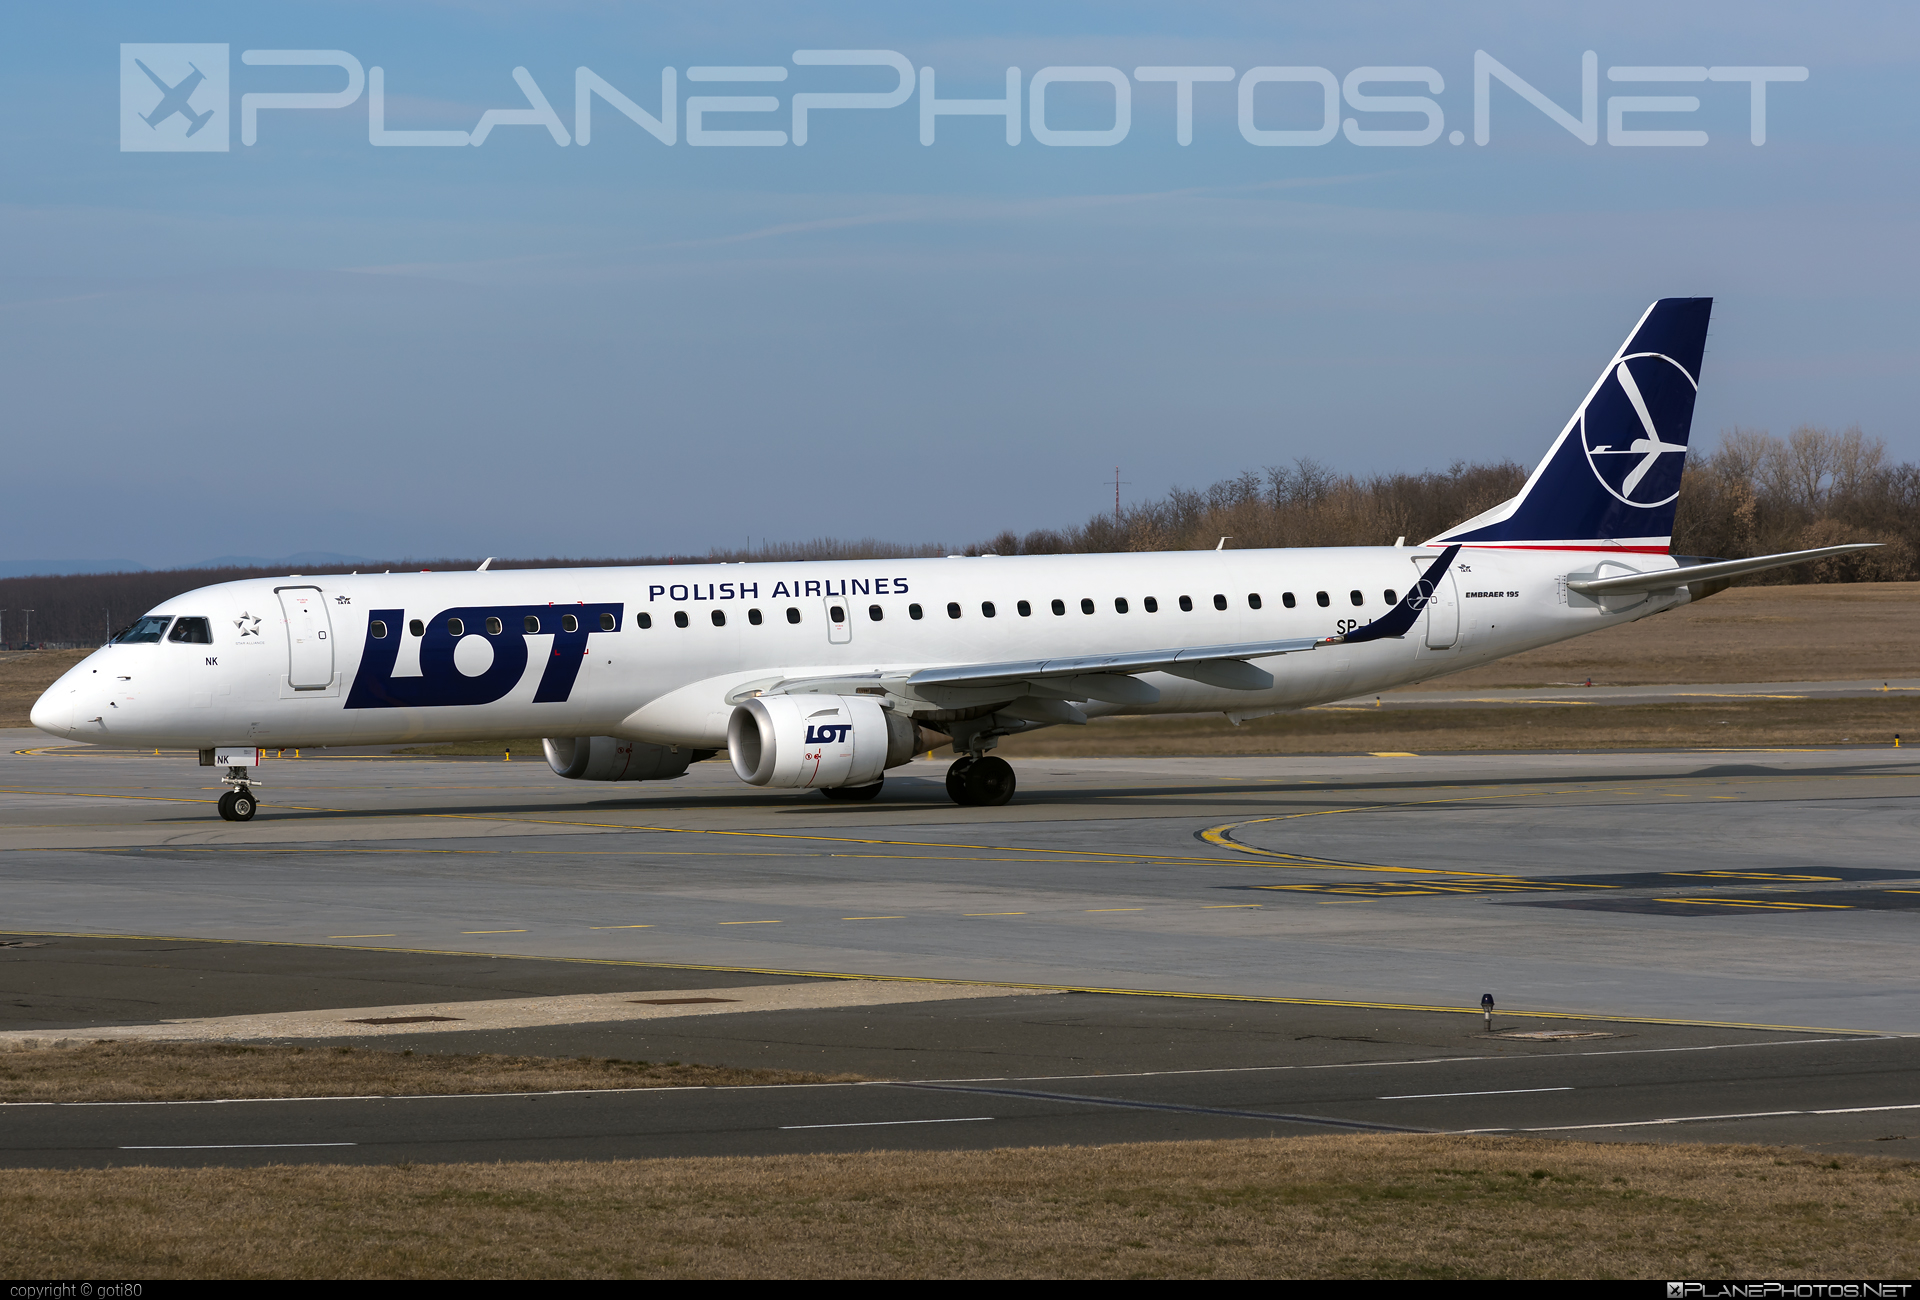 Embraer E195LR (ERJ-190-200LR) - SP-LNK operated by LOT Polish Airlines #e190 #e190200 #e190200lr #e195lr #embraer #embraer190200lr #embraer195 #embraer195lr #lot #lotpolishairlines